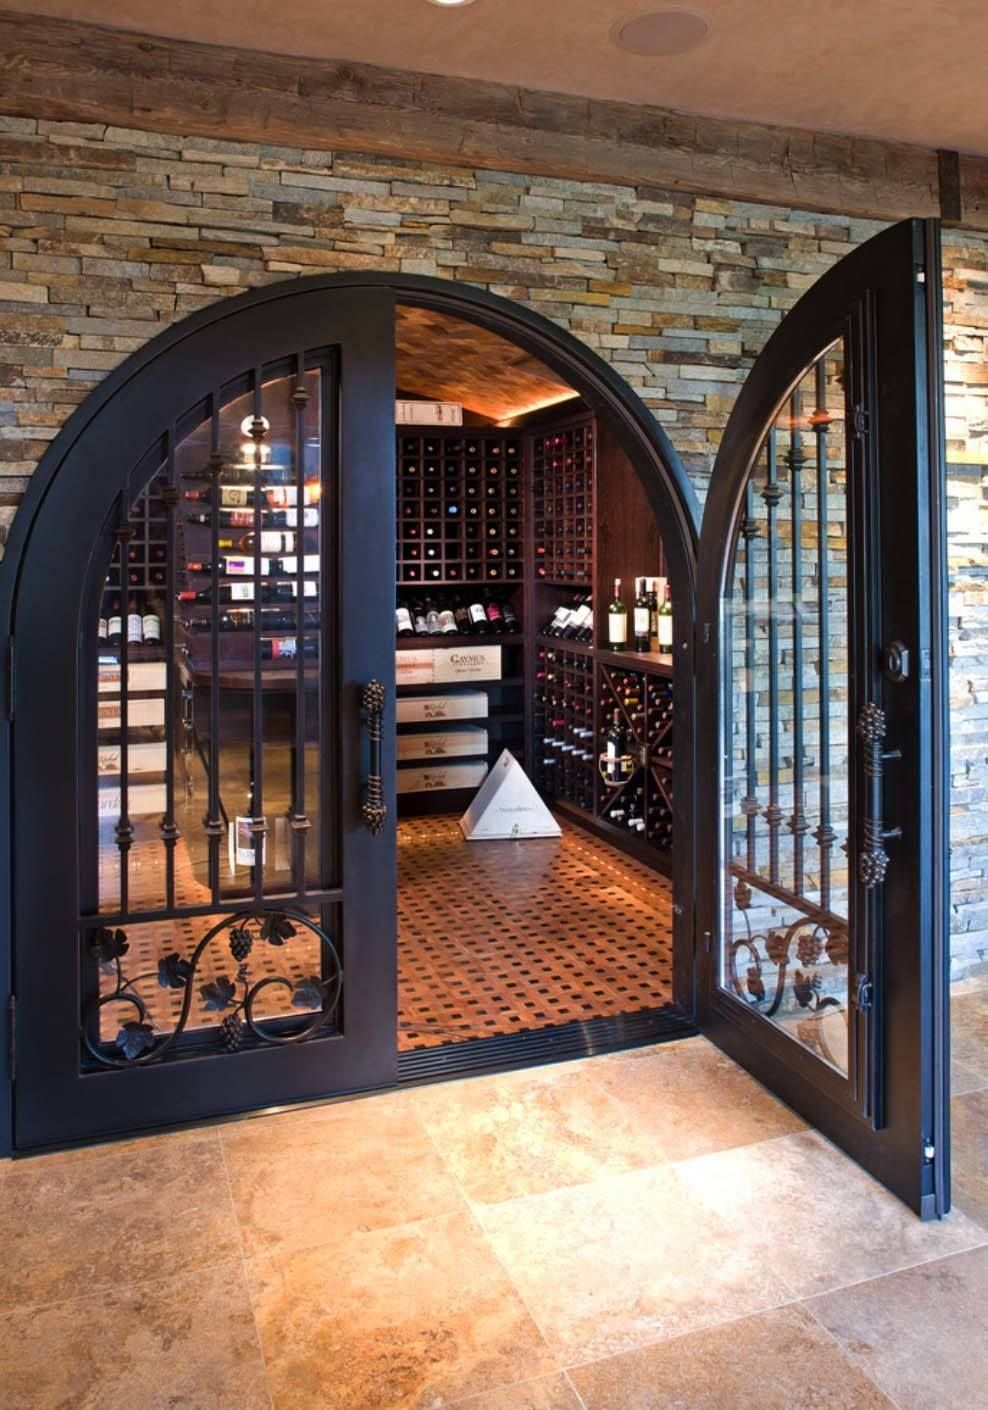 Modern Organic Home By John Kraemer Sons In Minneapolis Usa: Take A Peek Inside This Stunning Modern-rustic Minnesota Home